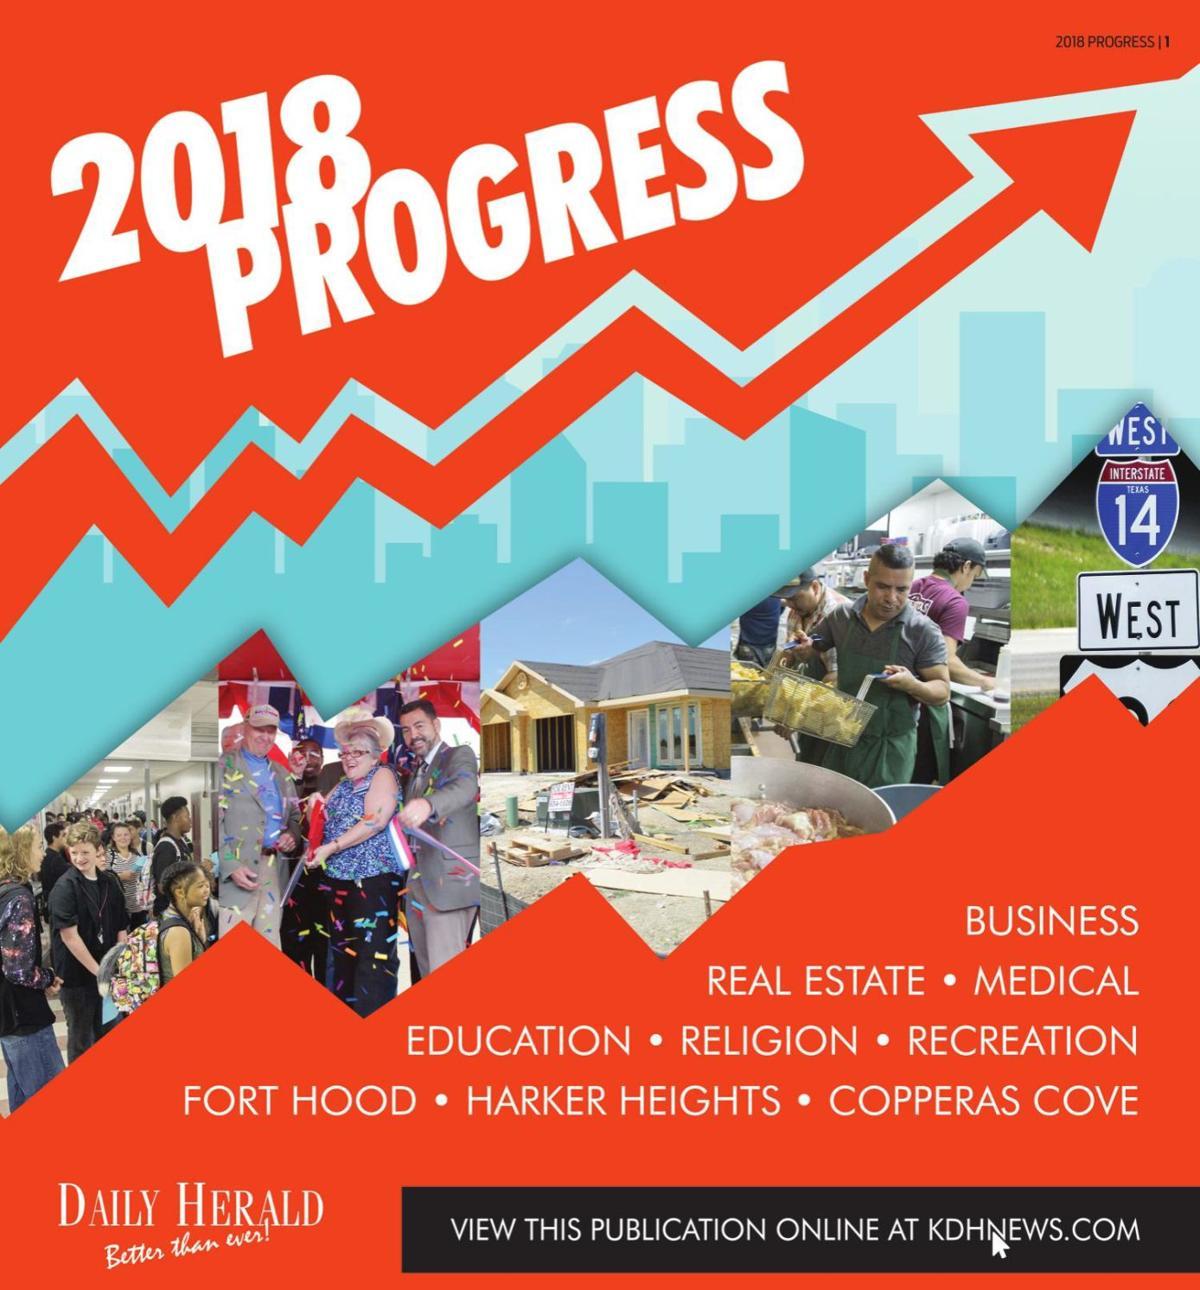 2018 Progress